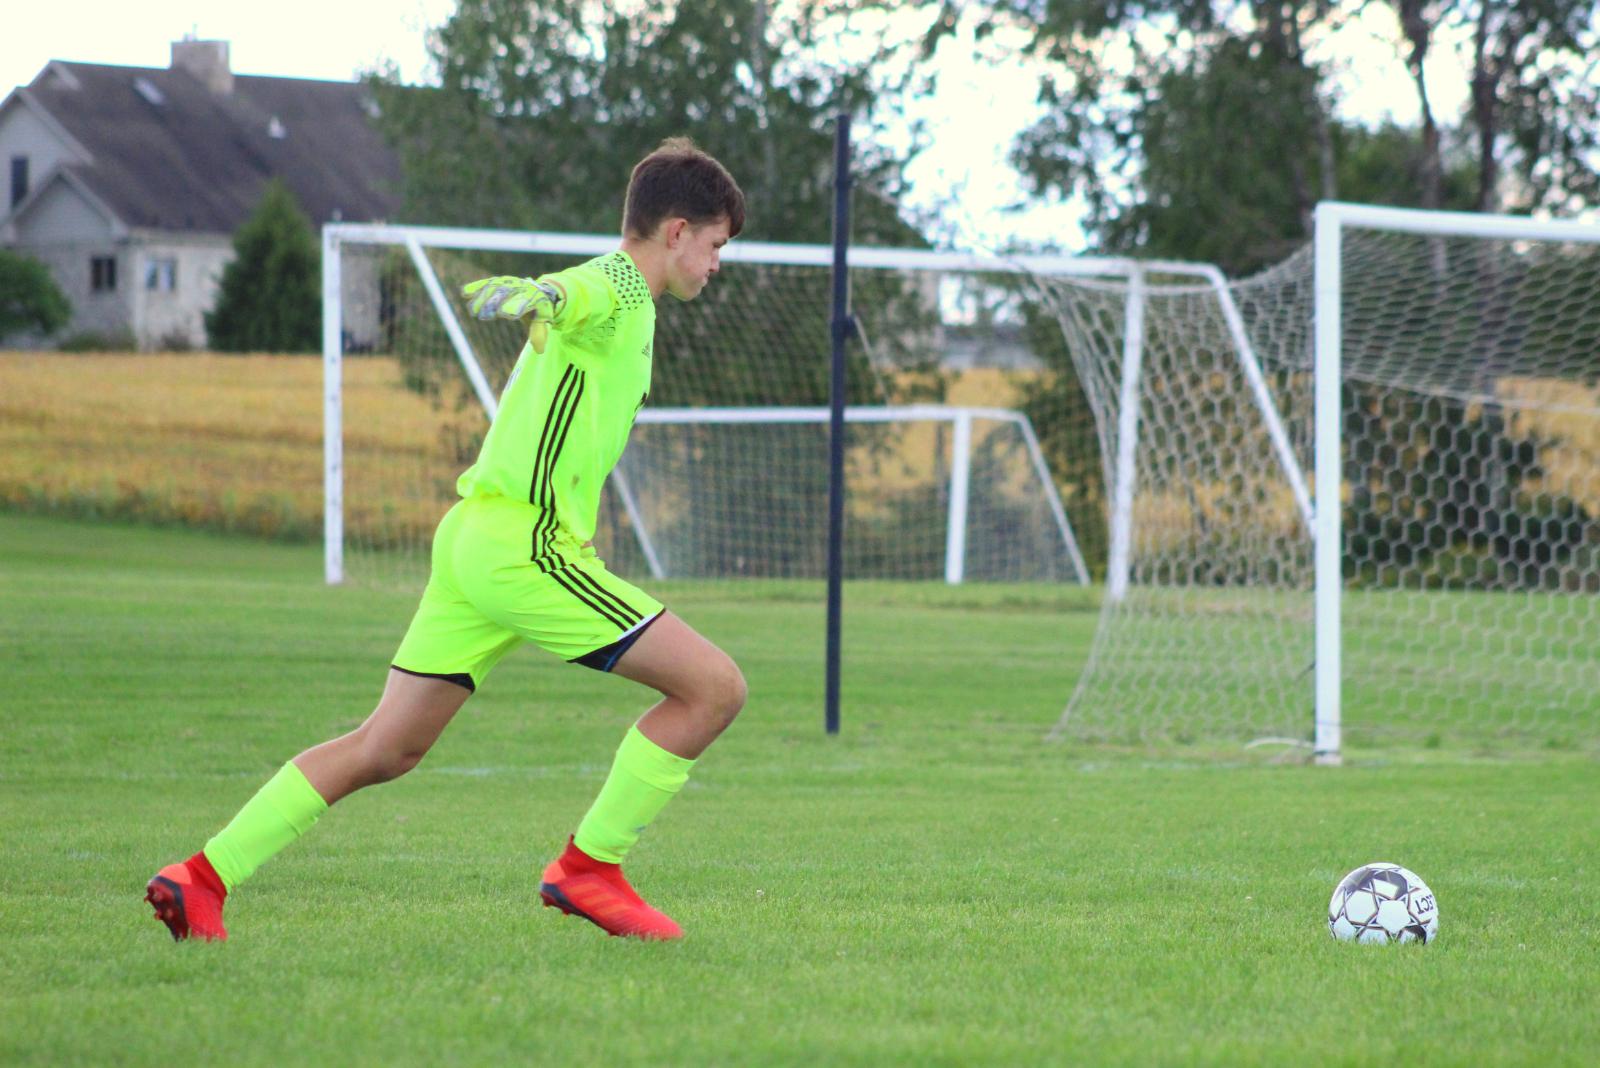 Boys Soccer (9-17-20) – courtesy of Leffel